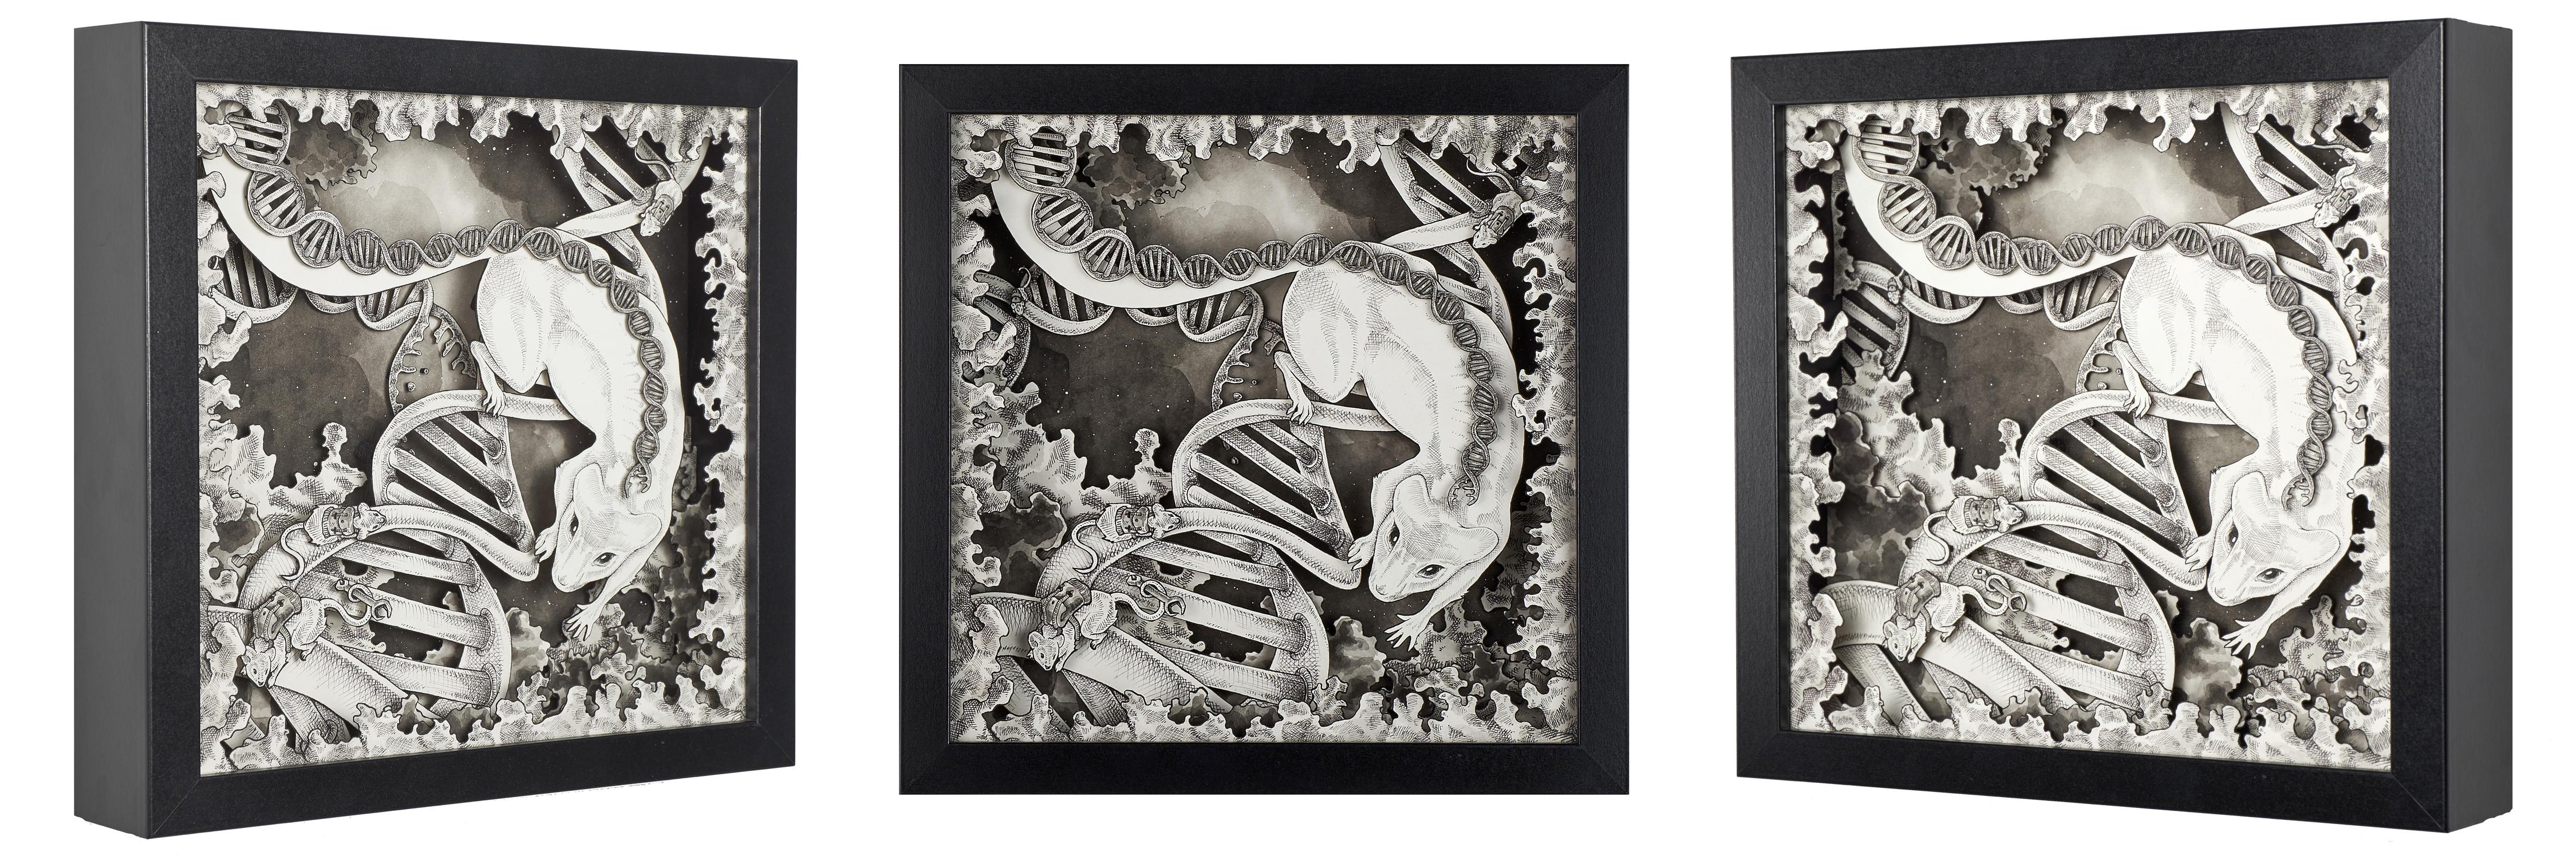 Foundation of us Artwork by Daria Aksenova